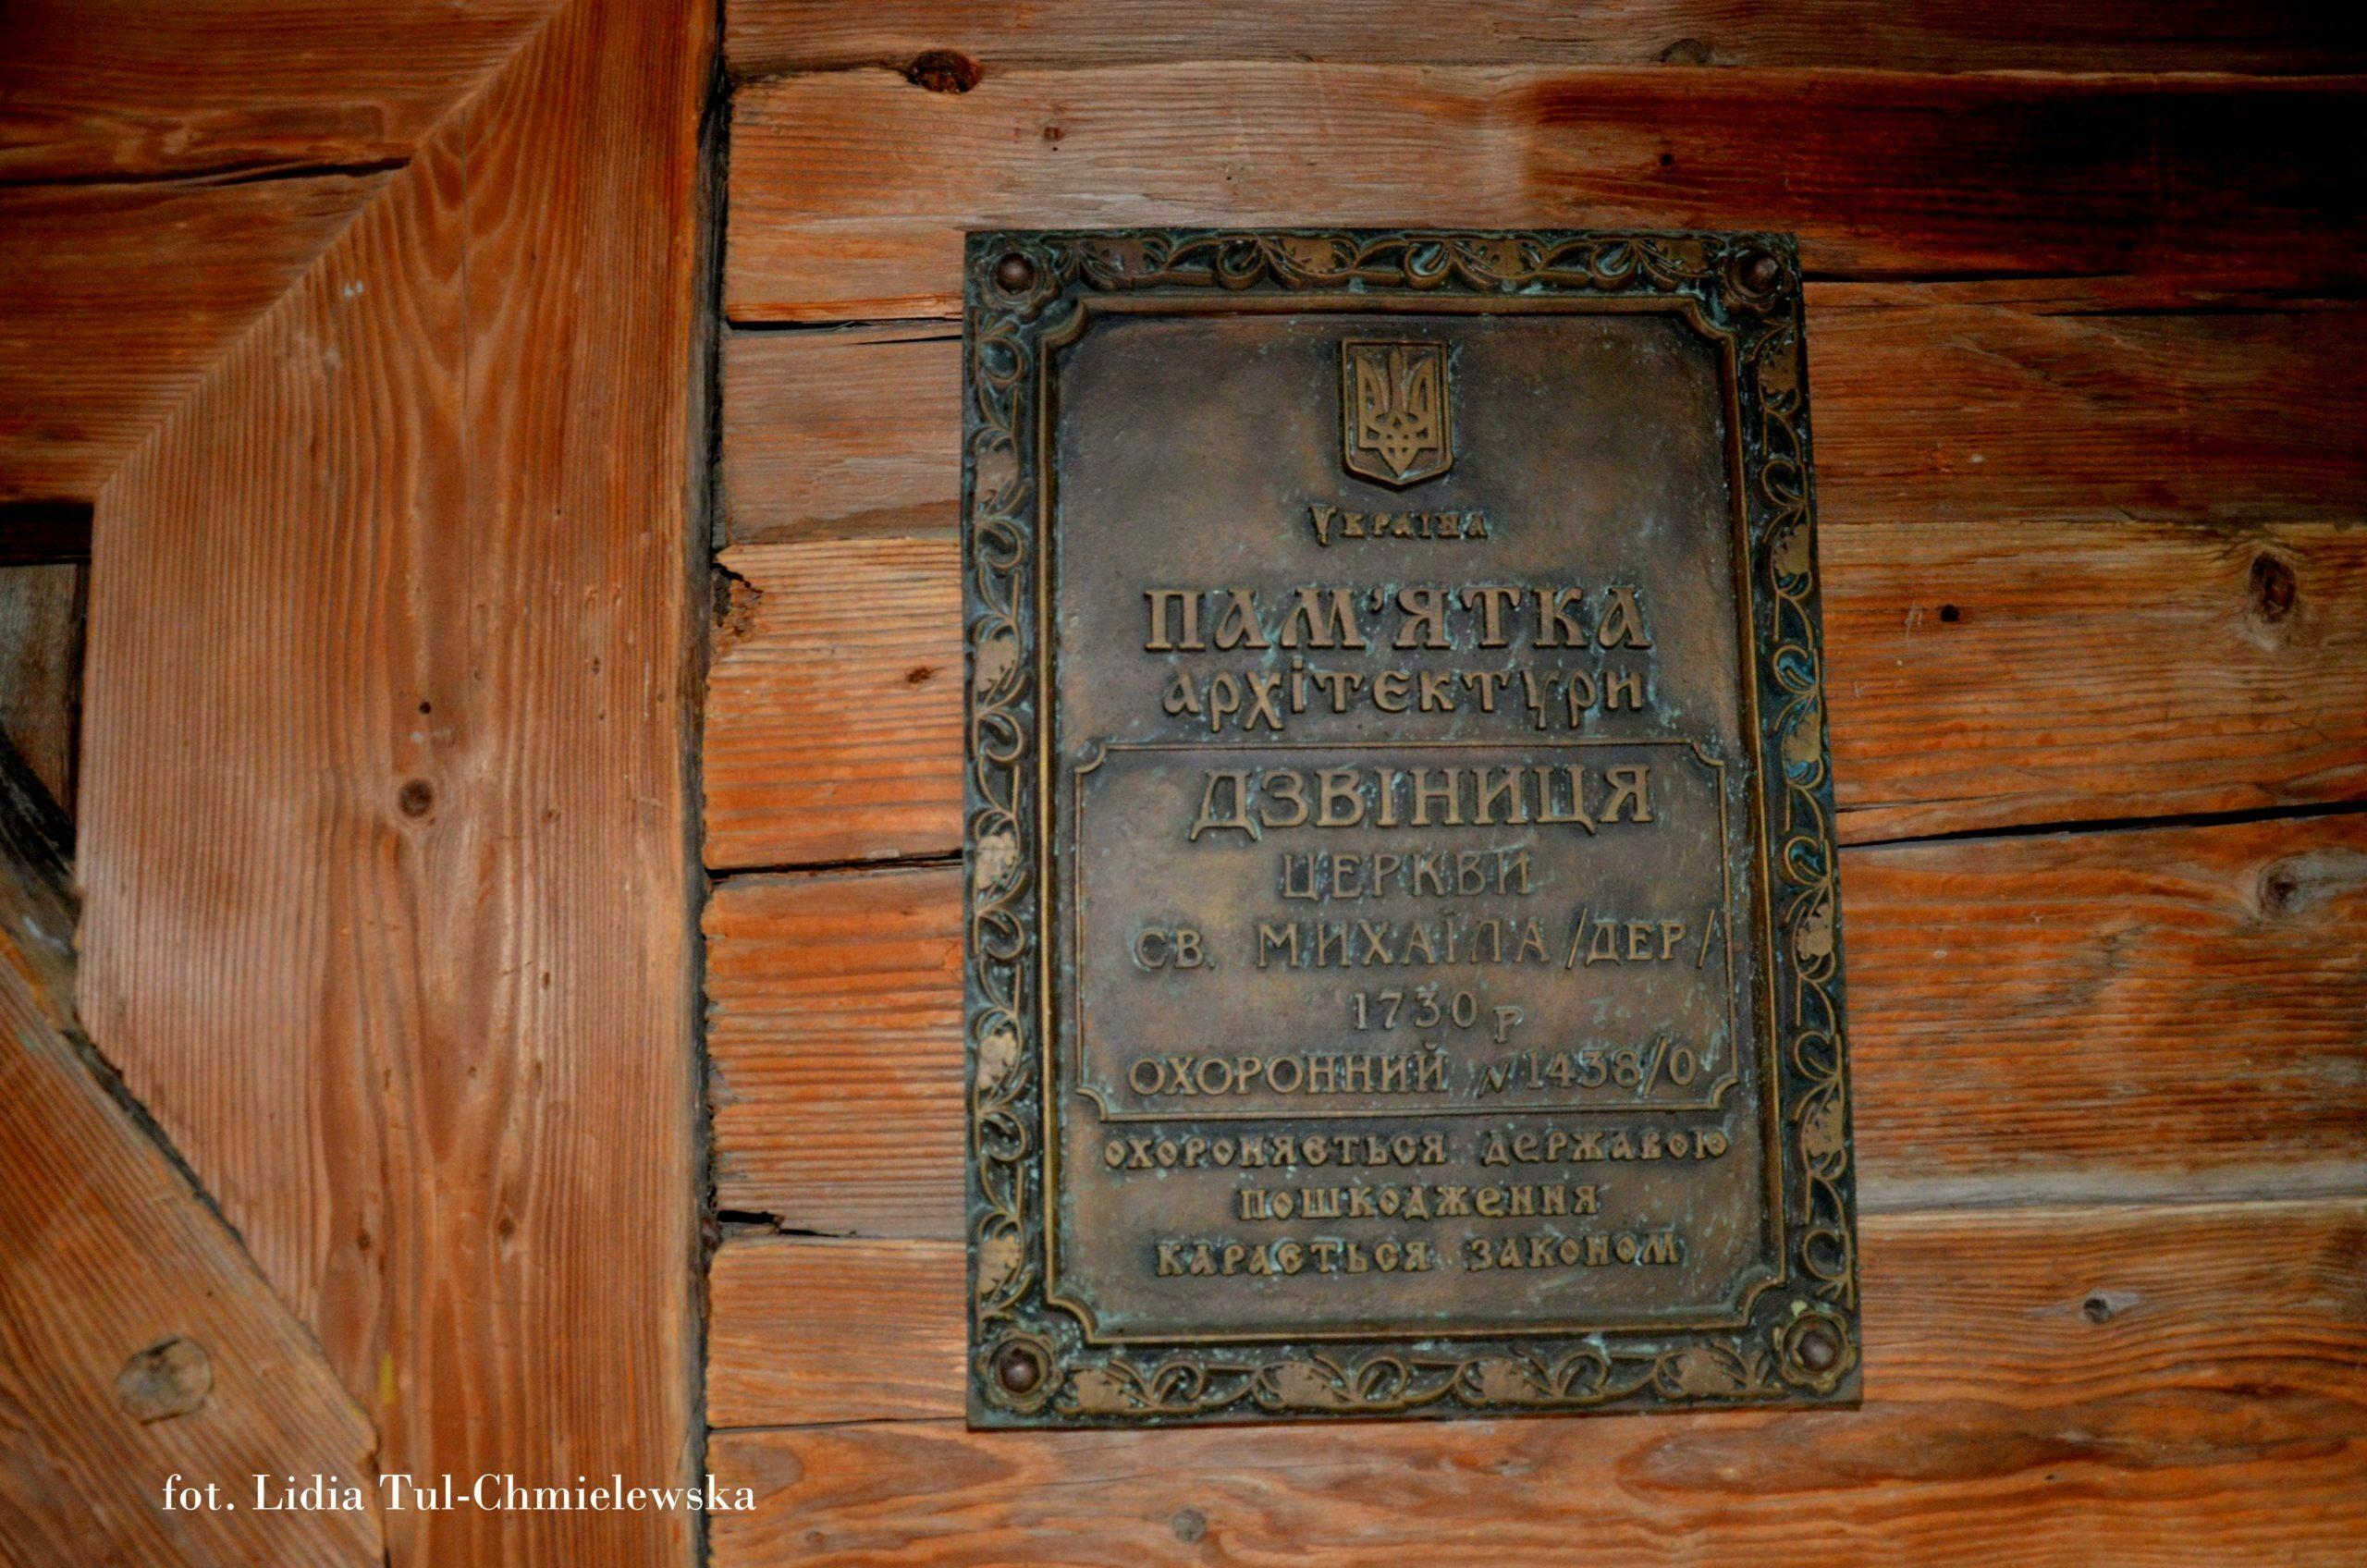 Jasienica Zamkowa tablica na dzwonnicy fot. Lidia Tul-Chmielewska